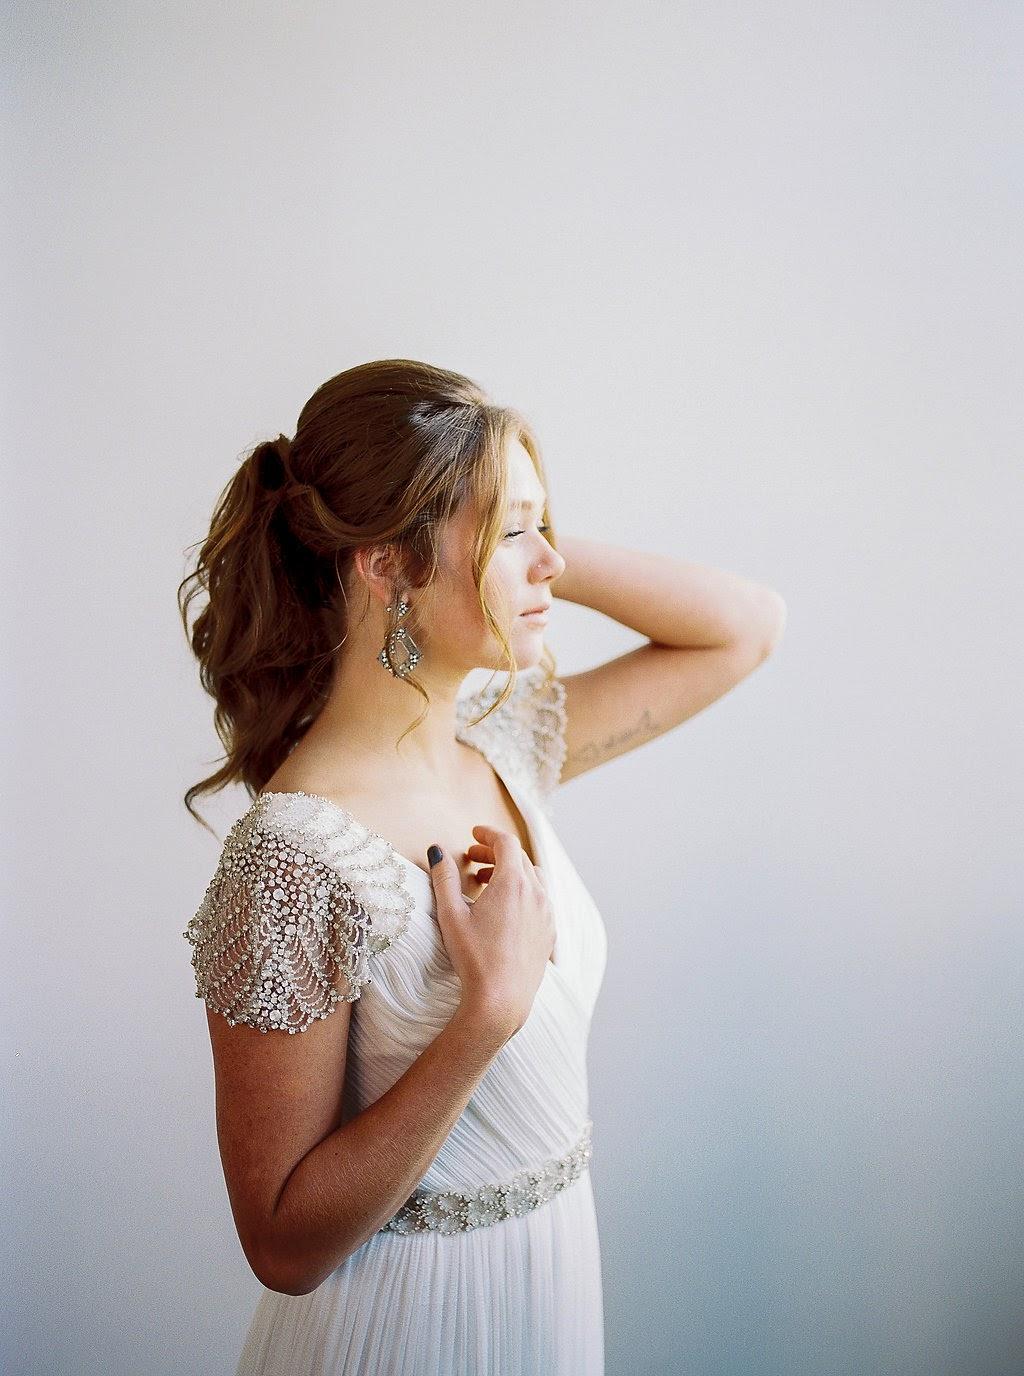 Alexandra-Elise-Photography-Ali-Reed-Film-Wedding-Photographer-173.jpg